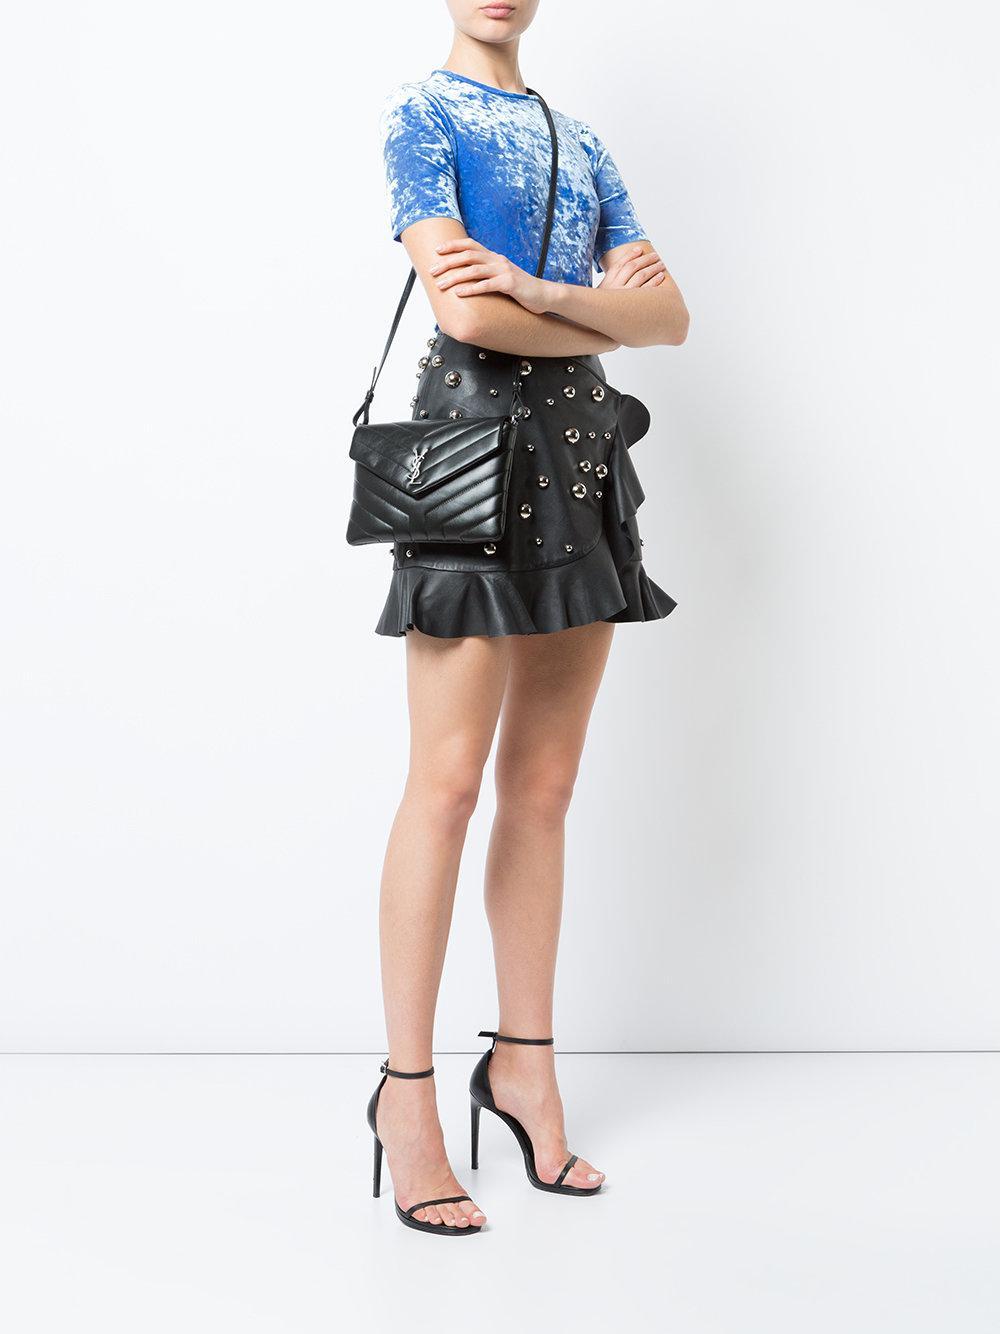 e6130b0f6a0 Saint Laurent Toy Loulou Flap Front Bag in Black - Lyst